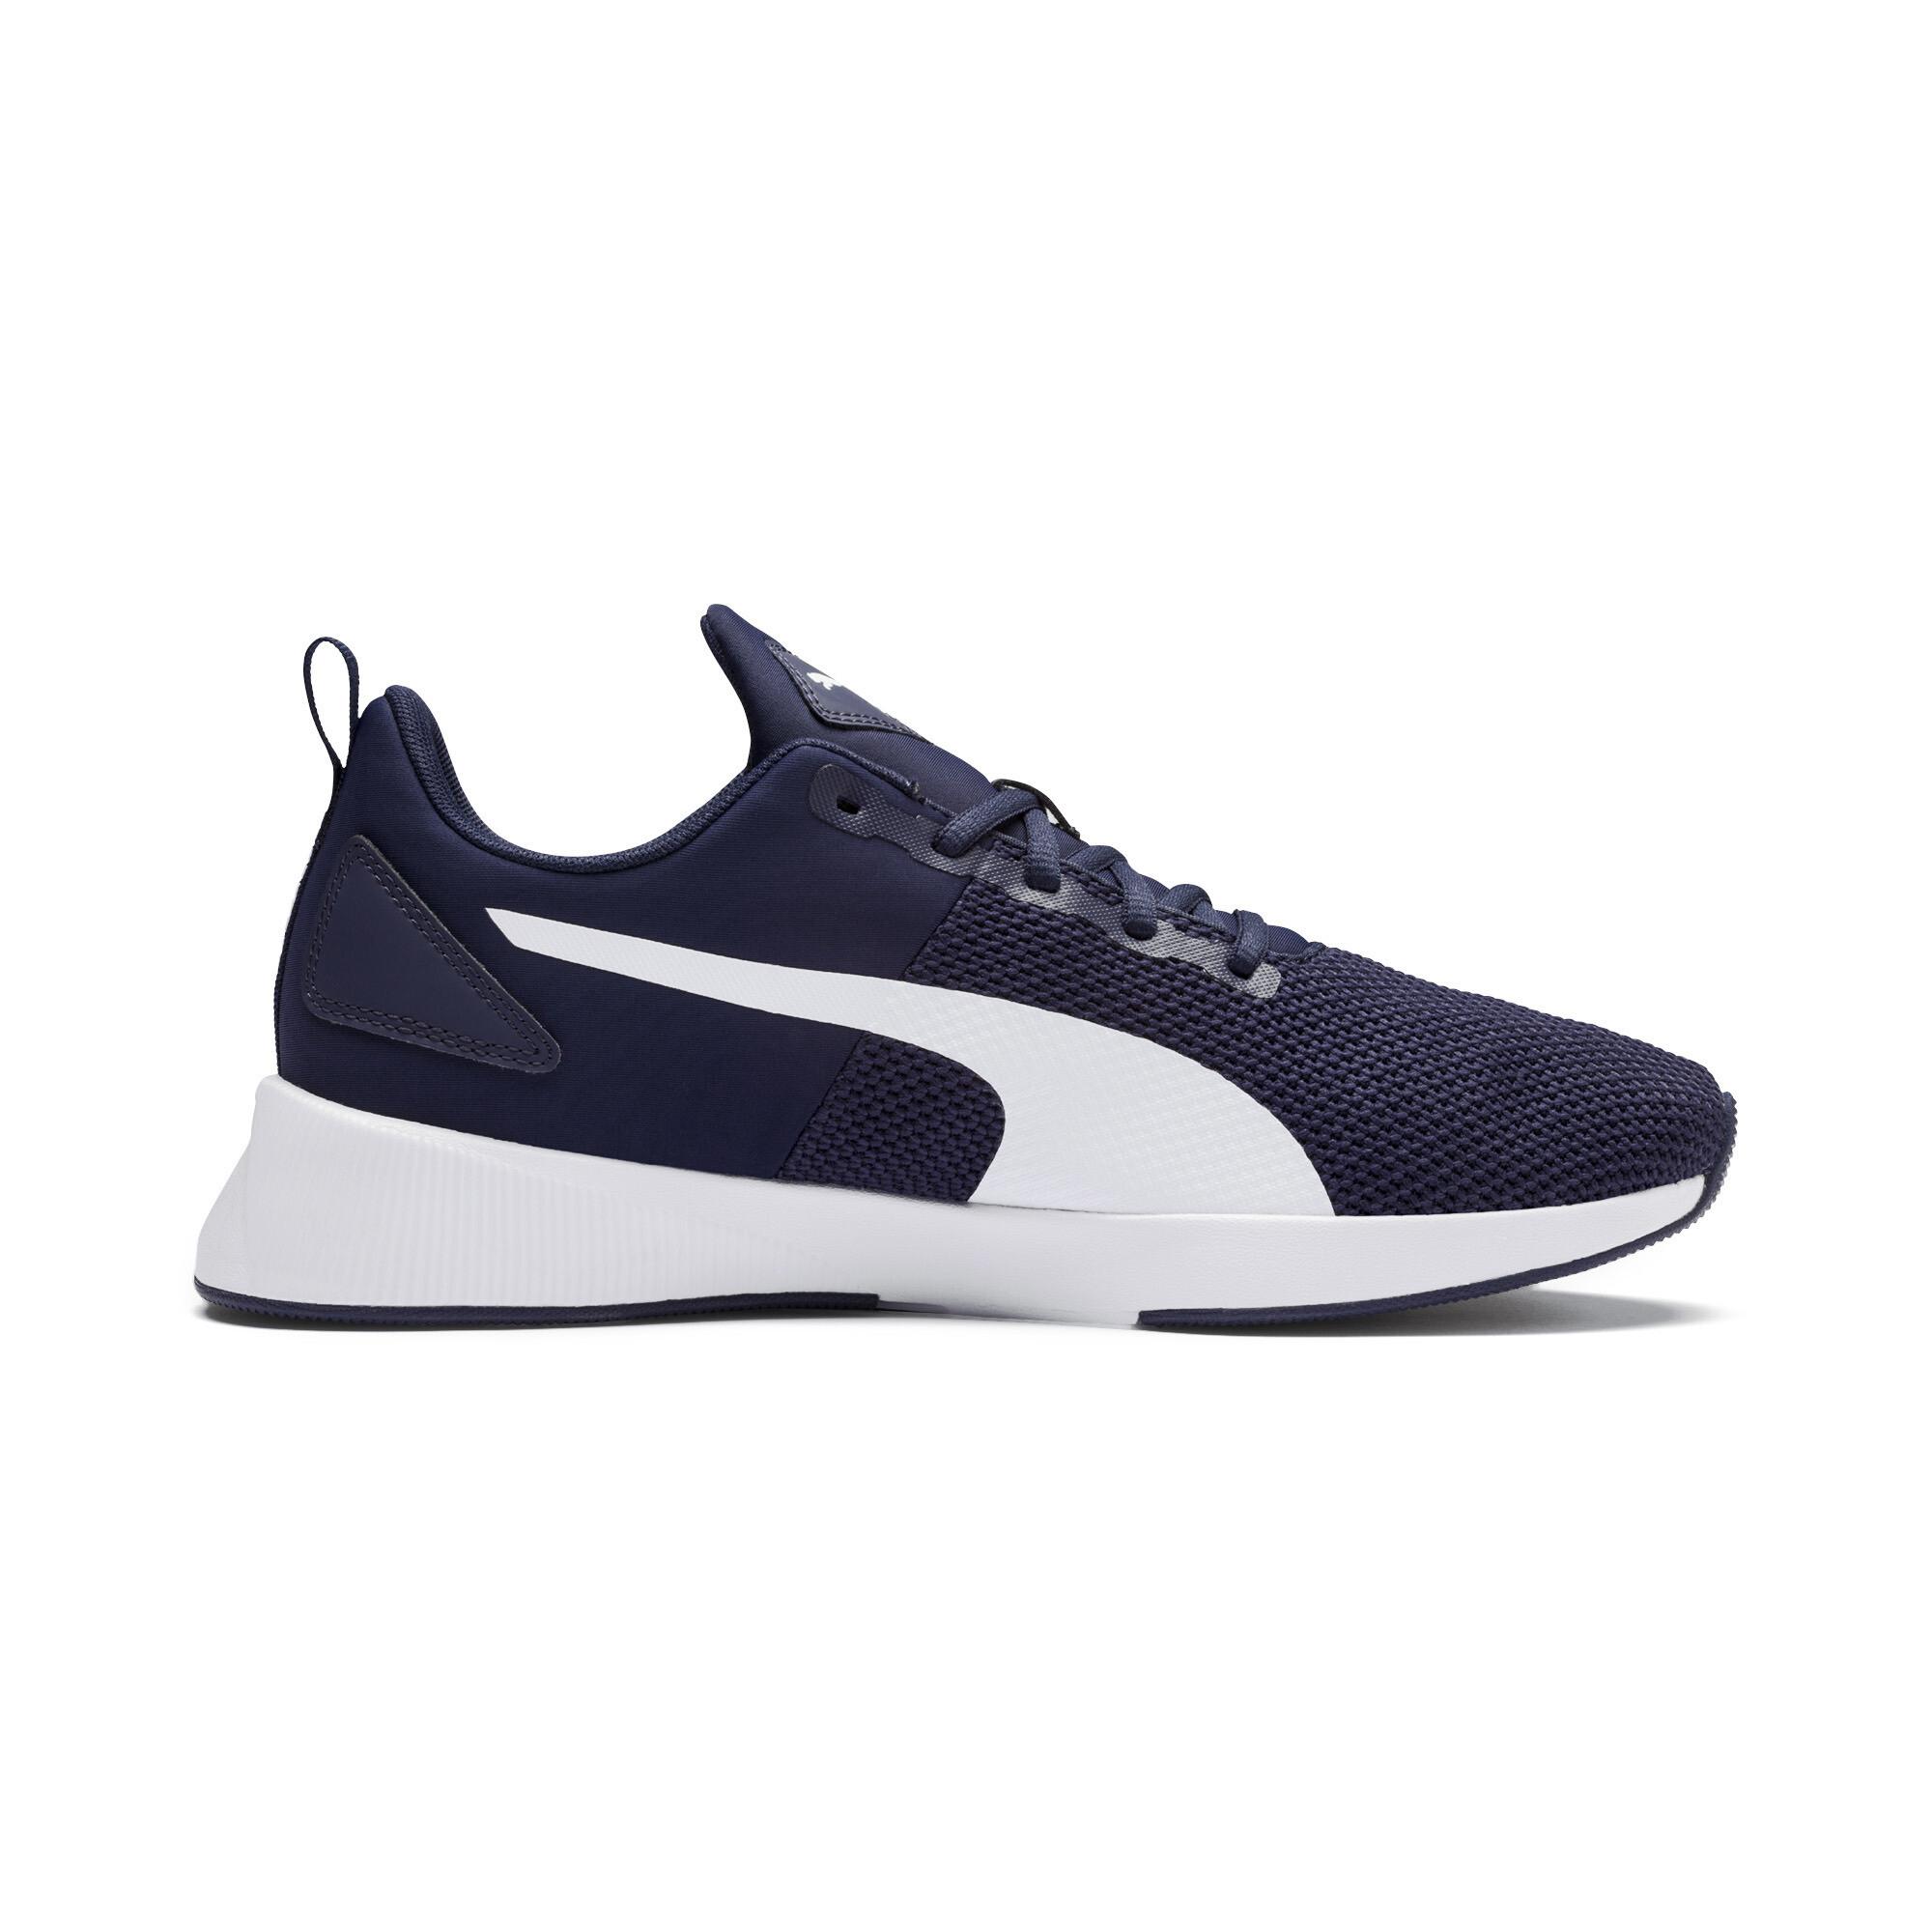 PUMA-Flyer-Runner-Running-Shoes-Mens-Shoe-Running thumbnail 12